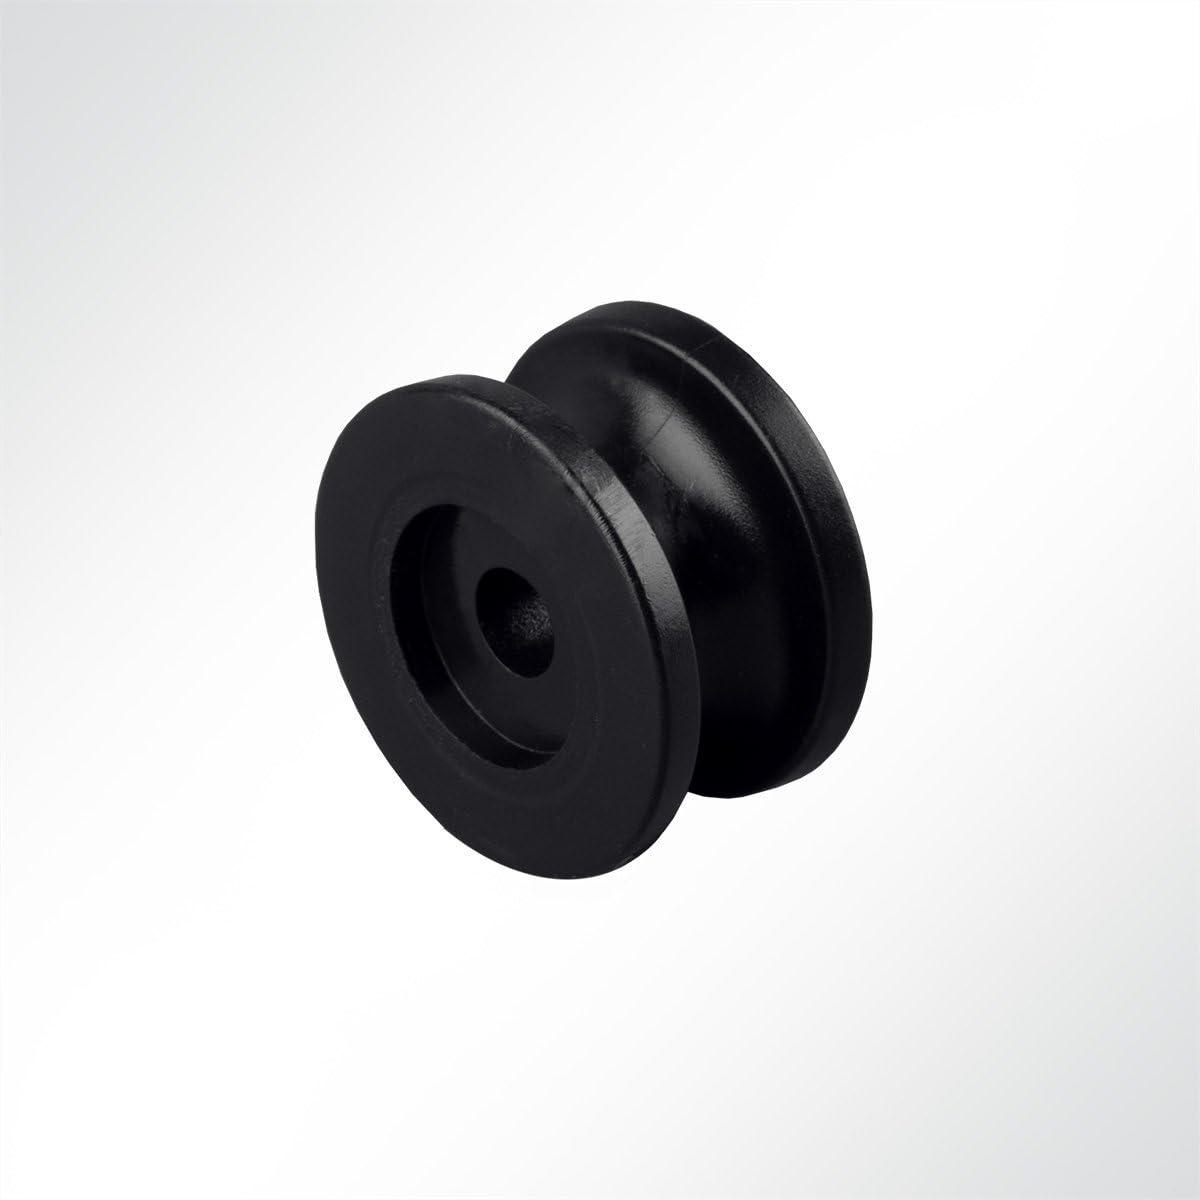 10 St/ück LYSEL Kunststoff Rundknopf, D 25mm in Wei/ß